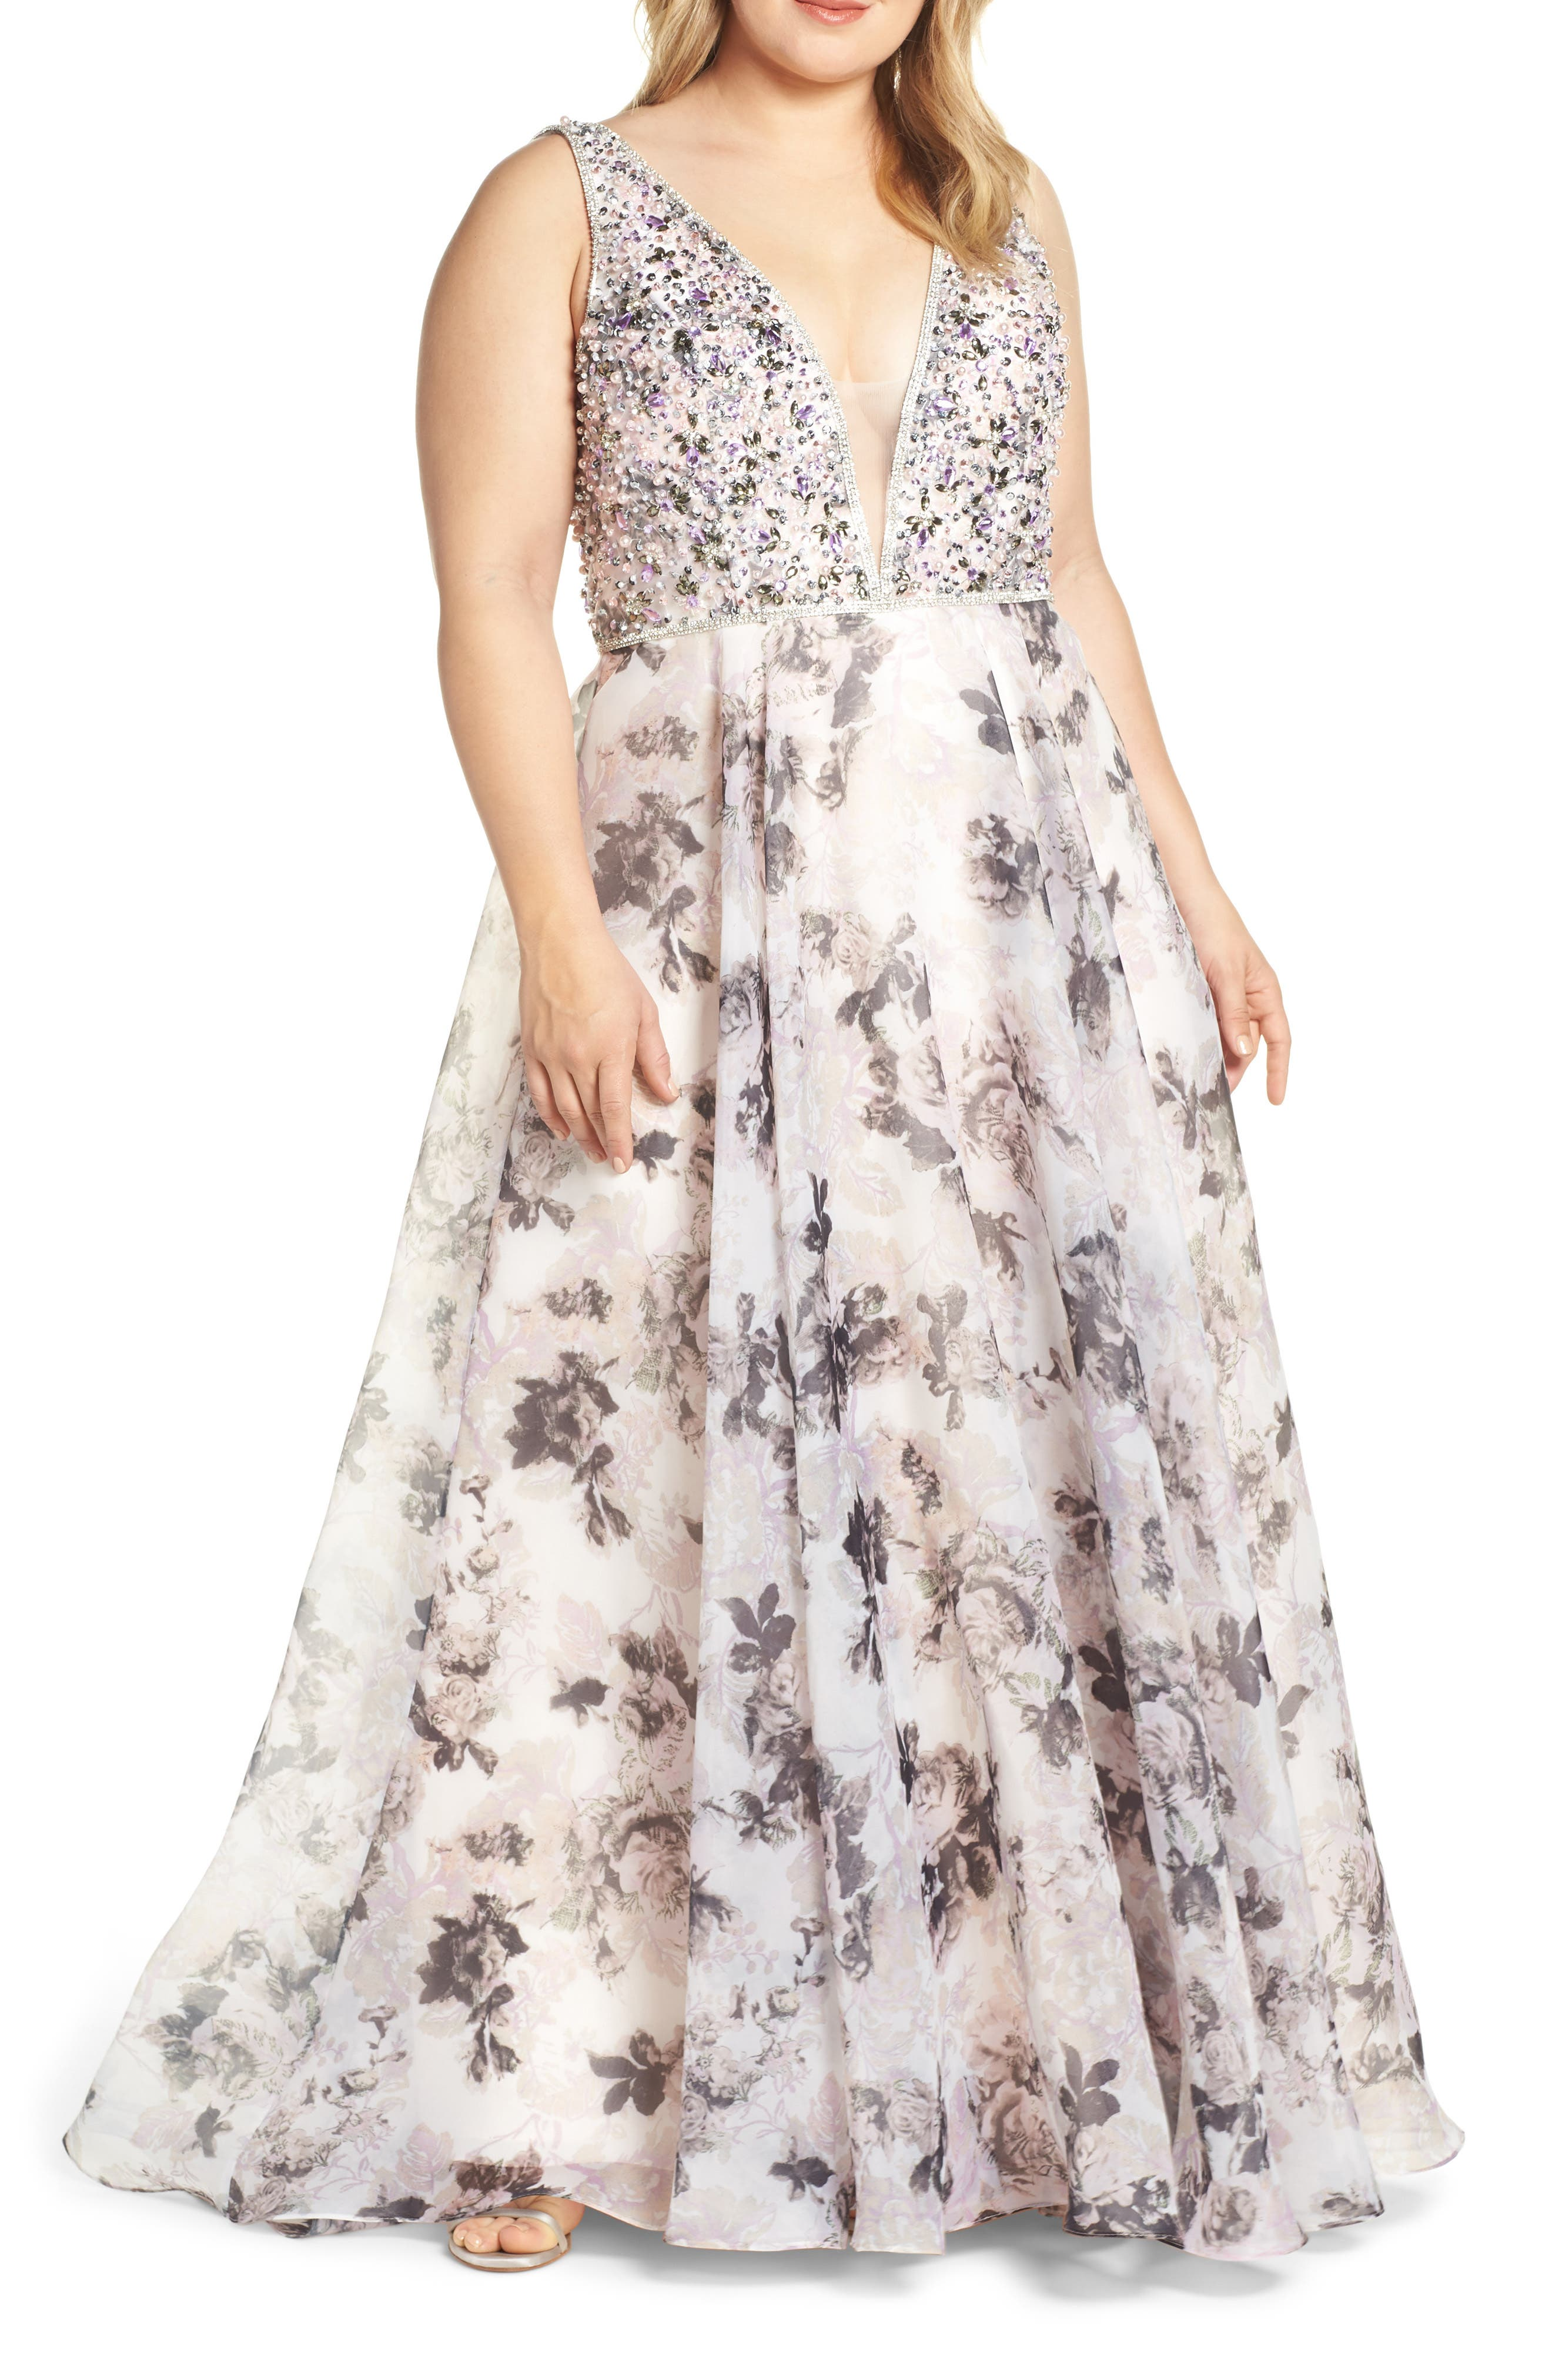 Plus Size MAC Duggal Floral Print Illusion V-Neck Evening Dress, Pink